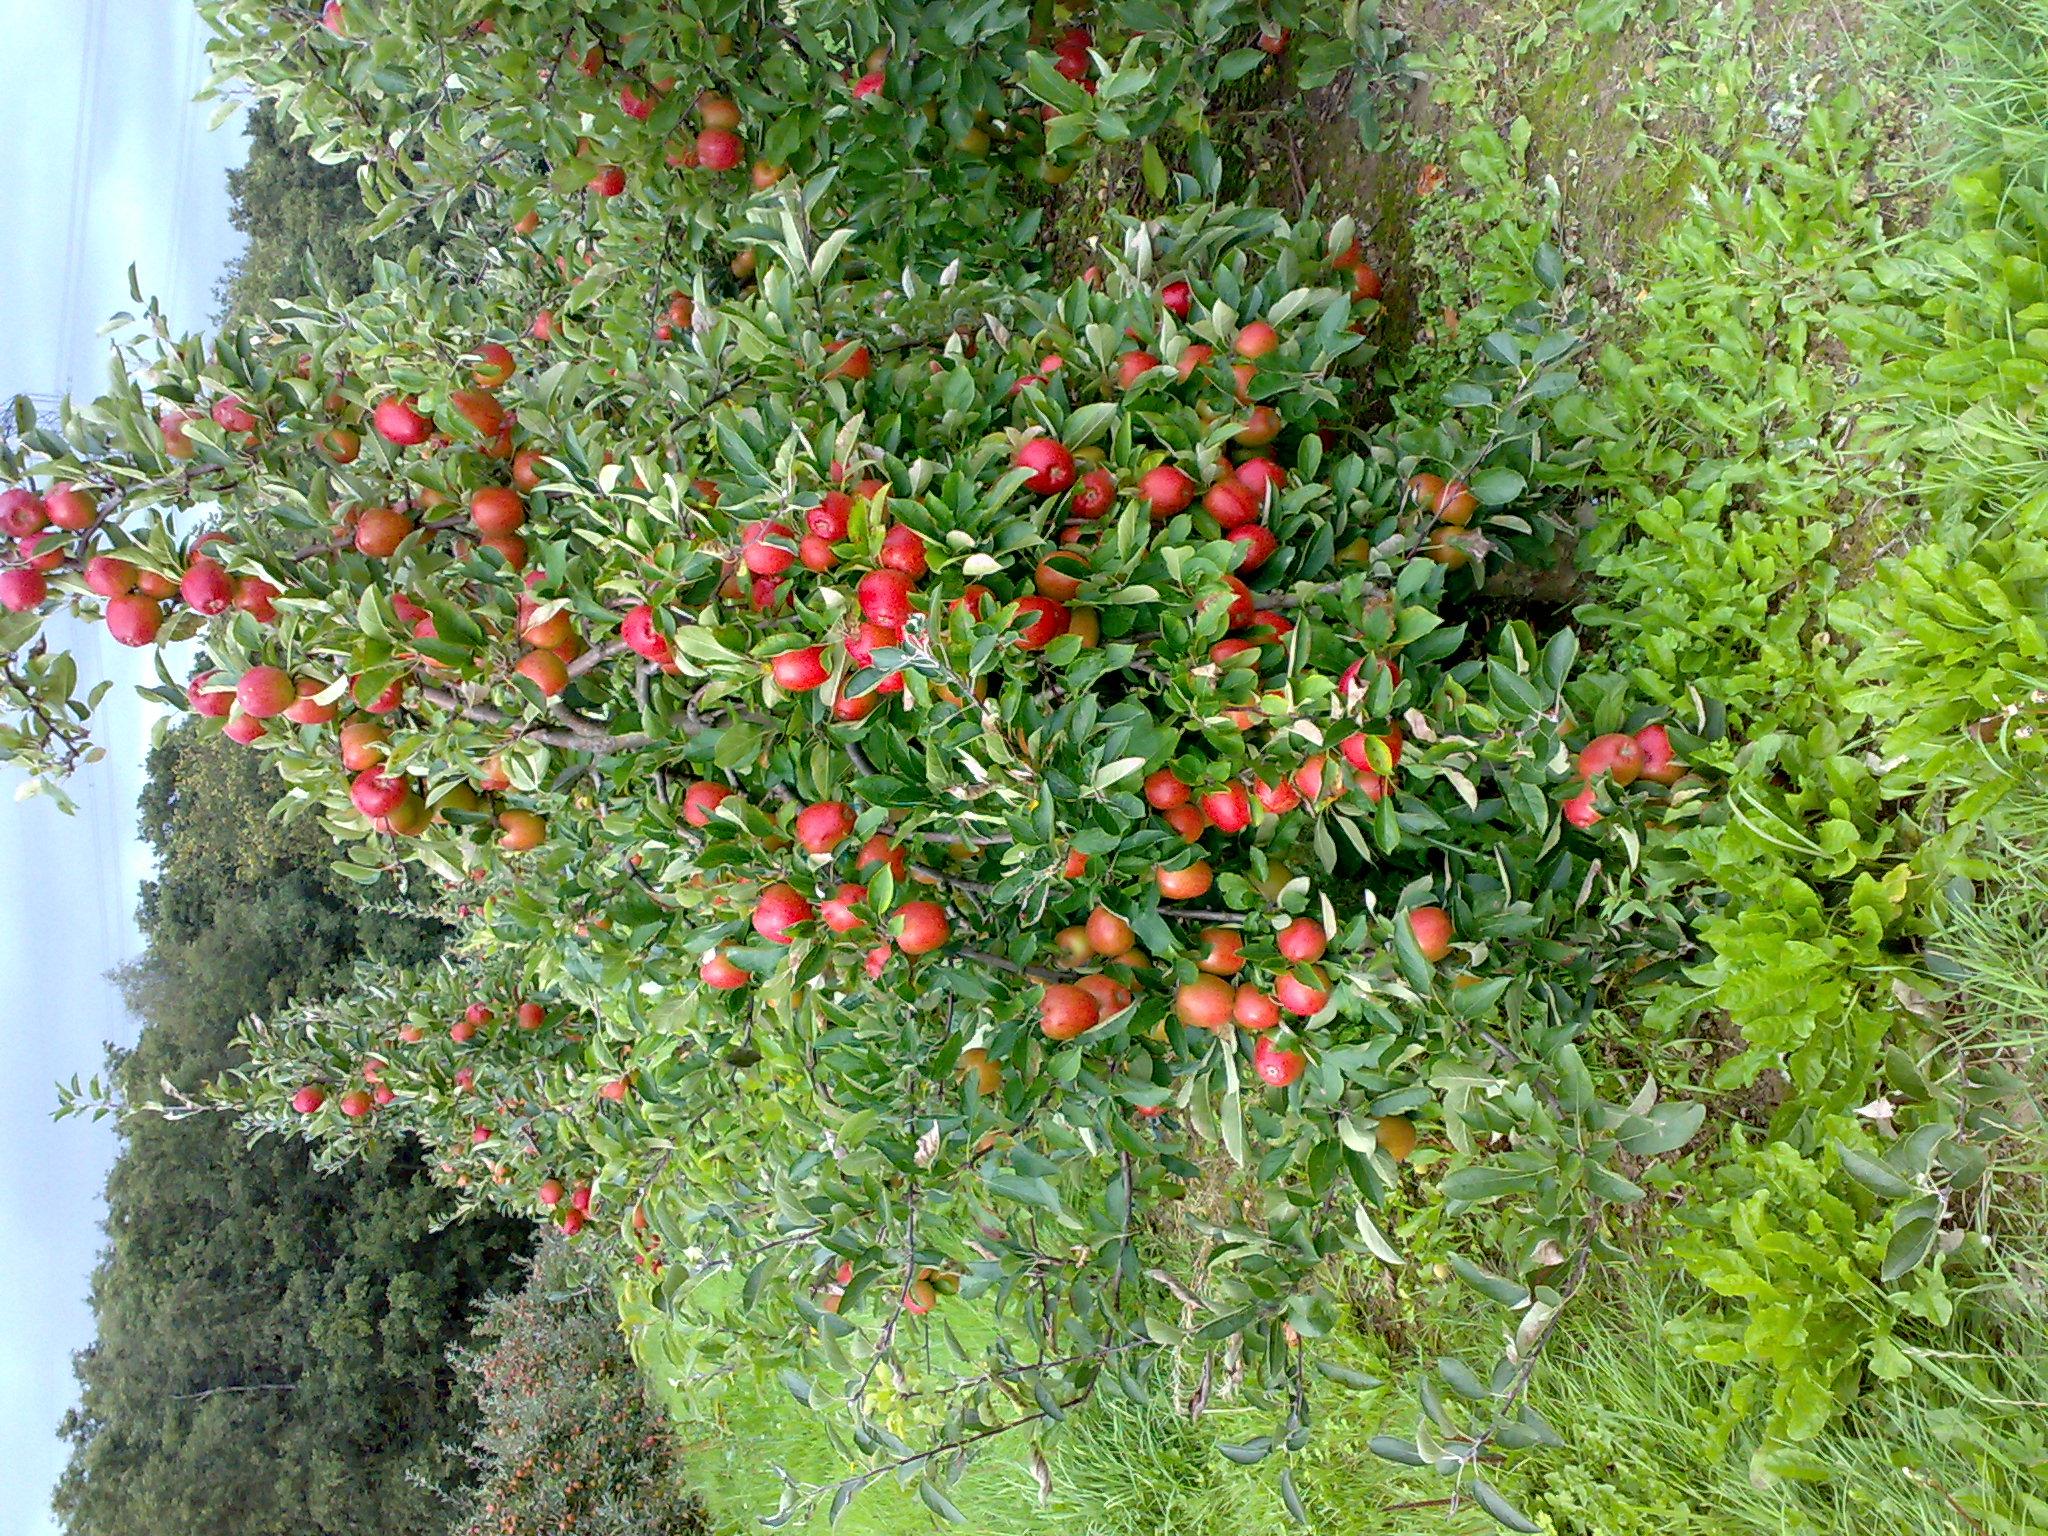 The healing biodiversitree ooto festival alison amazed for Fruit trees